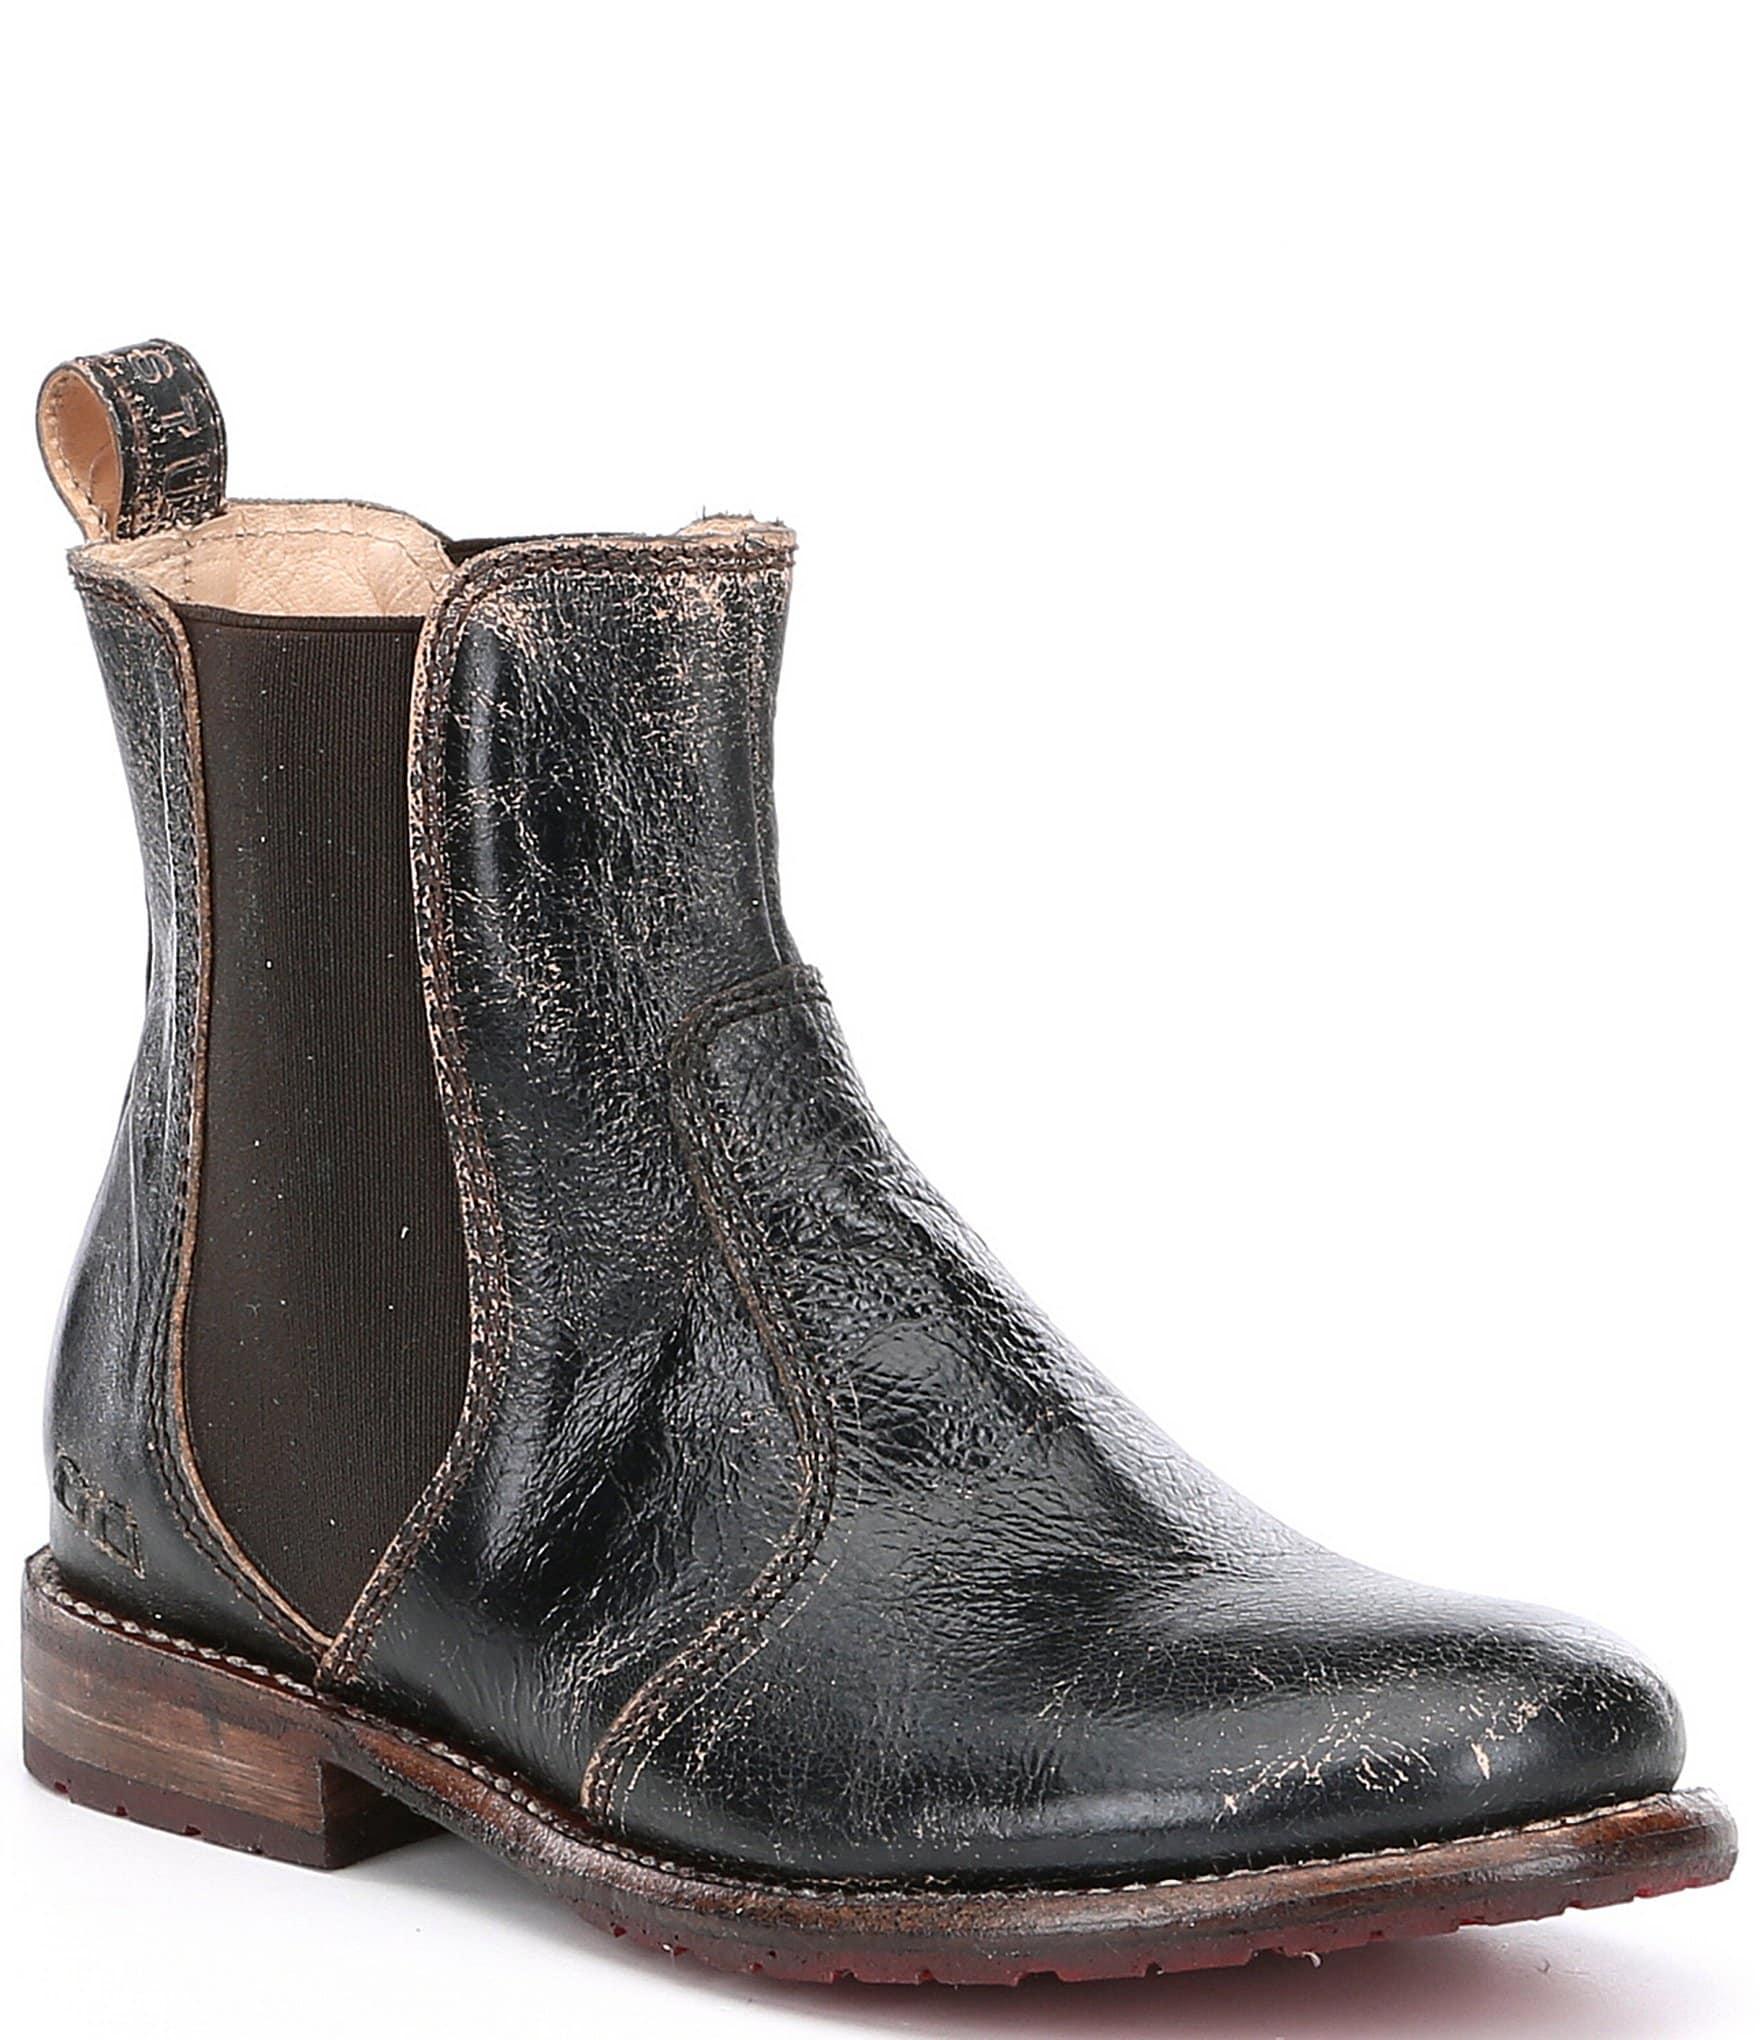 Bed Stu Nandi Chelsea Boots Dillards